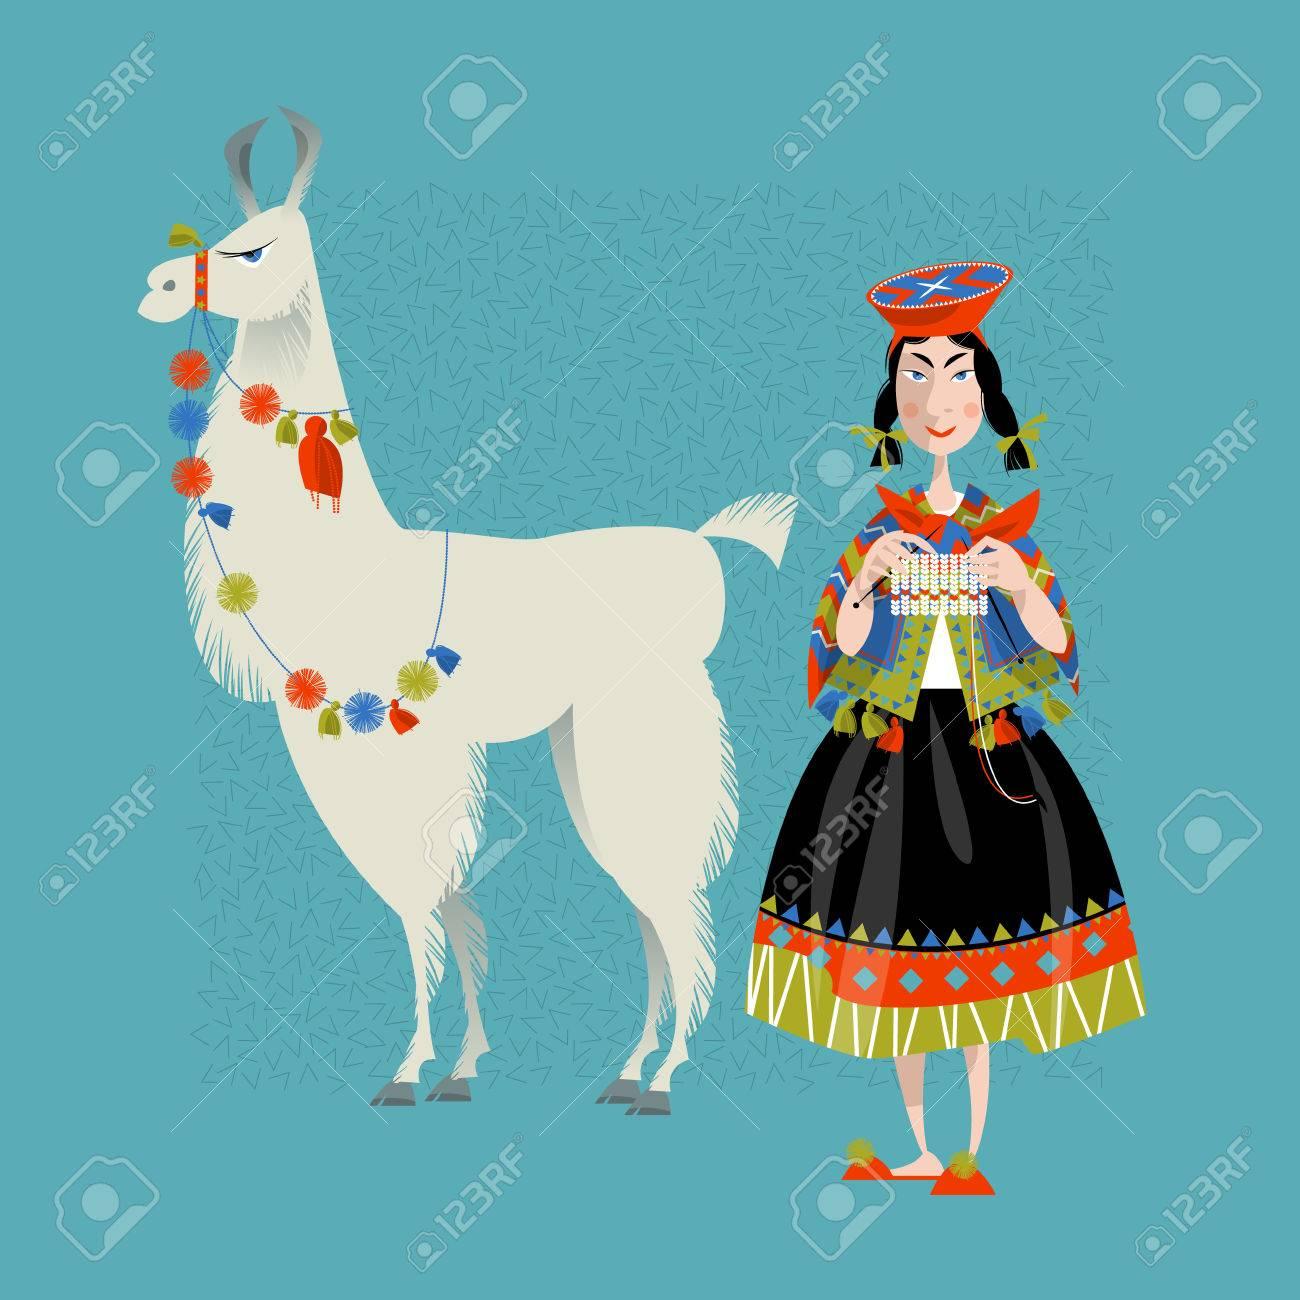 Lama Alpaca and knitting Peruvian woman. - 46954482